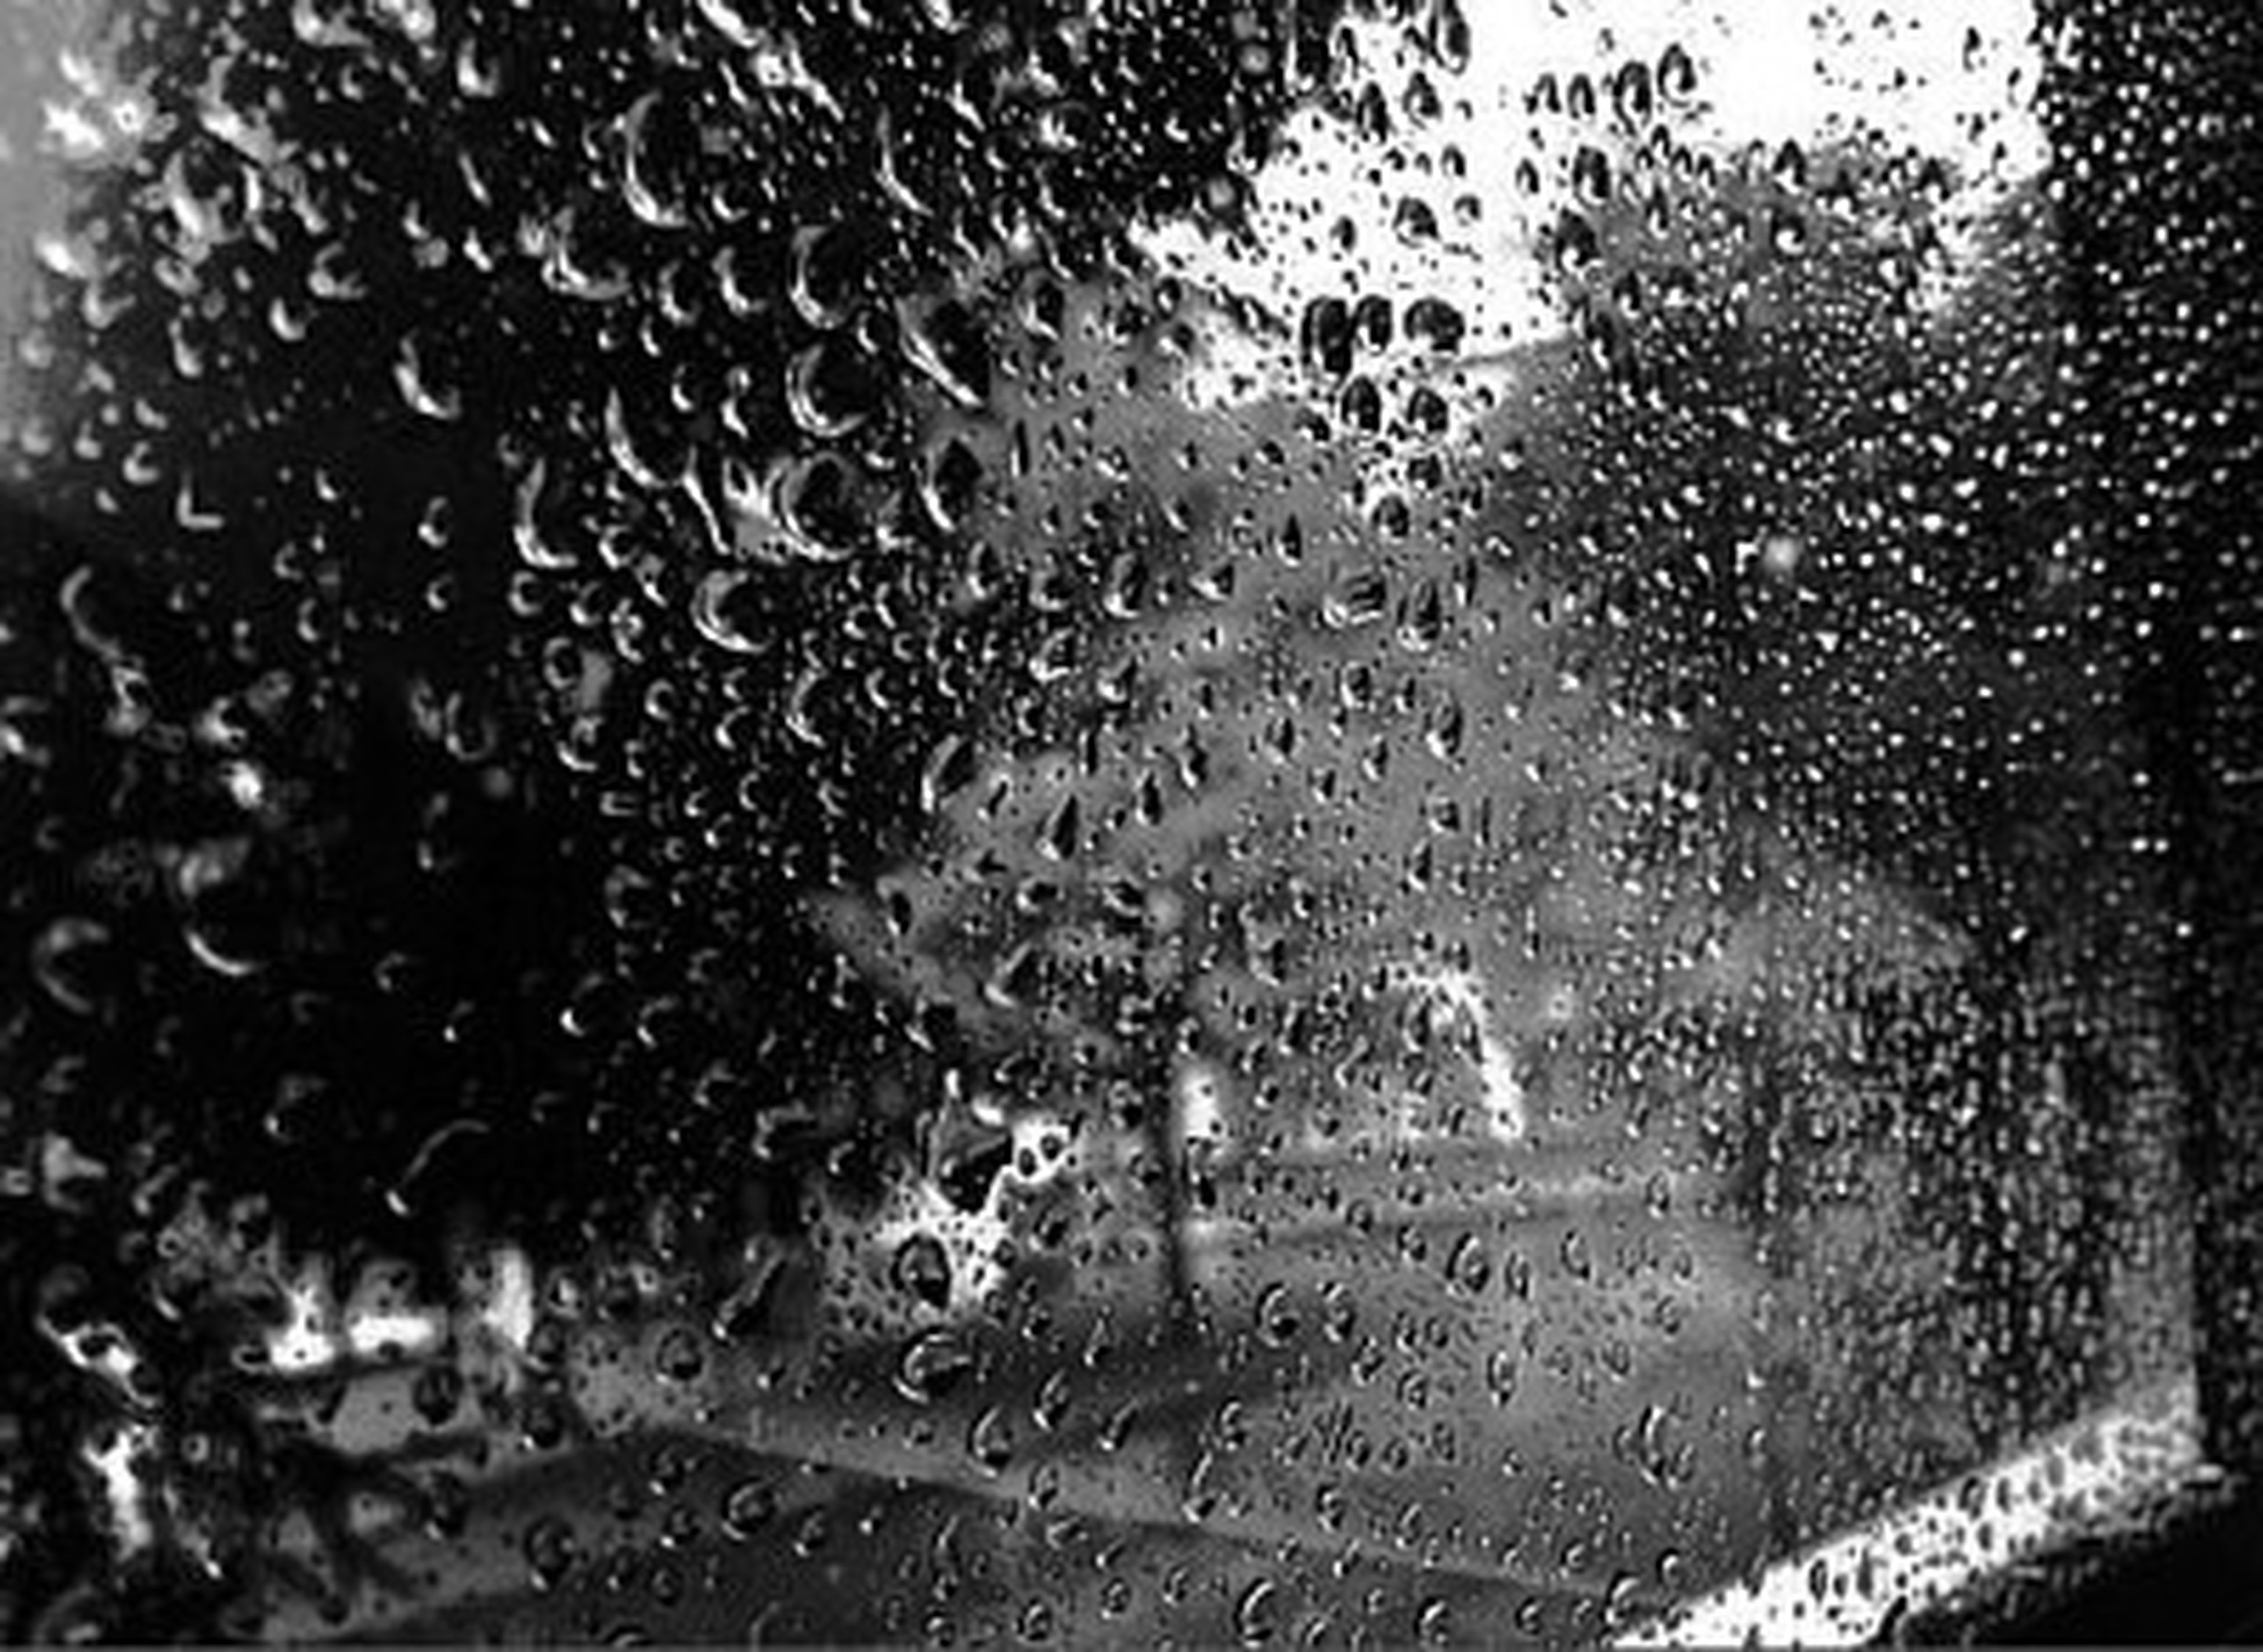 Thesoundofrain Sound Of Rain Is Music Photography Taking Photos Hello World Enjoying Life Relaxing God Point Of View EyeEm Best Shots Blackandwhite Monochrome Drops Black And White Friday